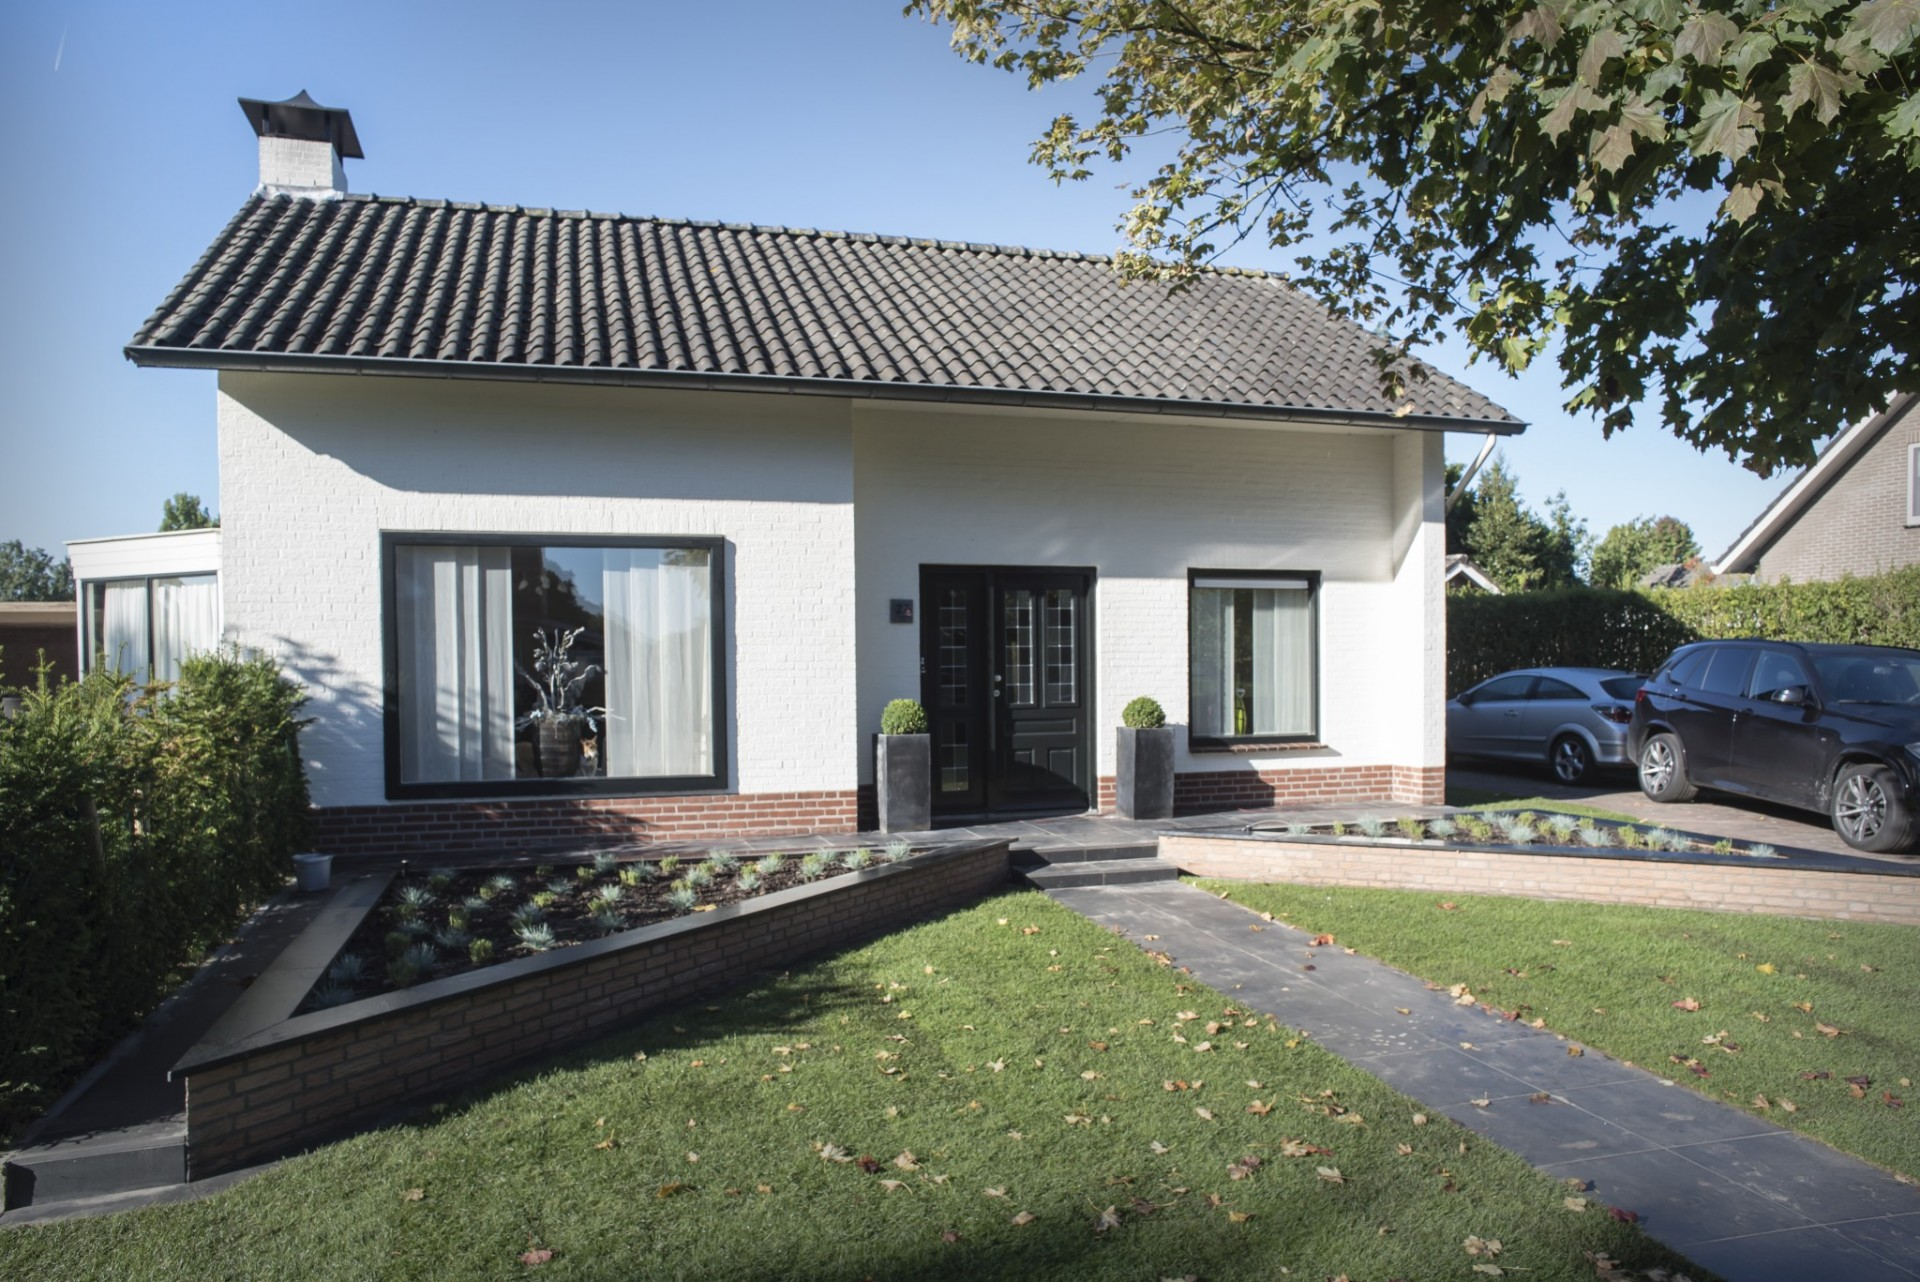 Fam Bontrup Landhorst Moderne Tuin Met Verdiept Terras En Strakke